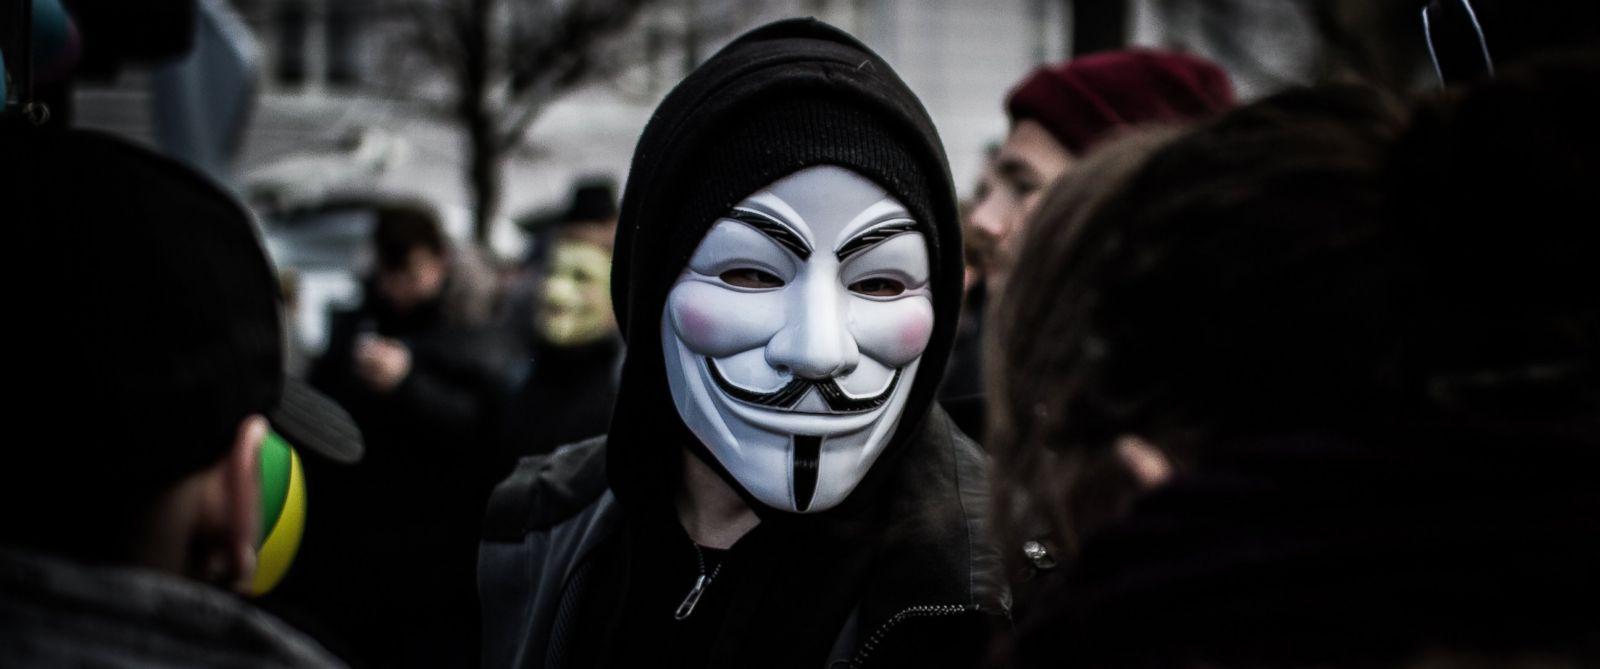 Tải ảnh hacker